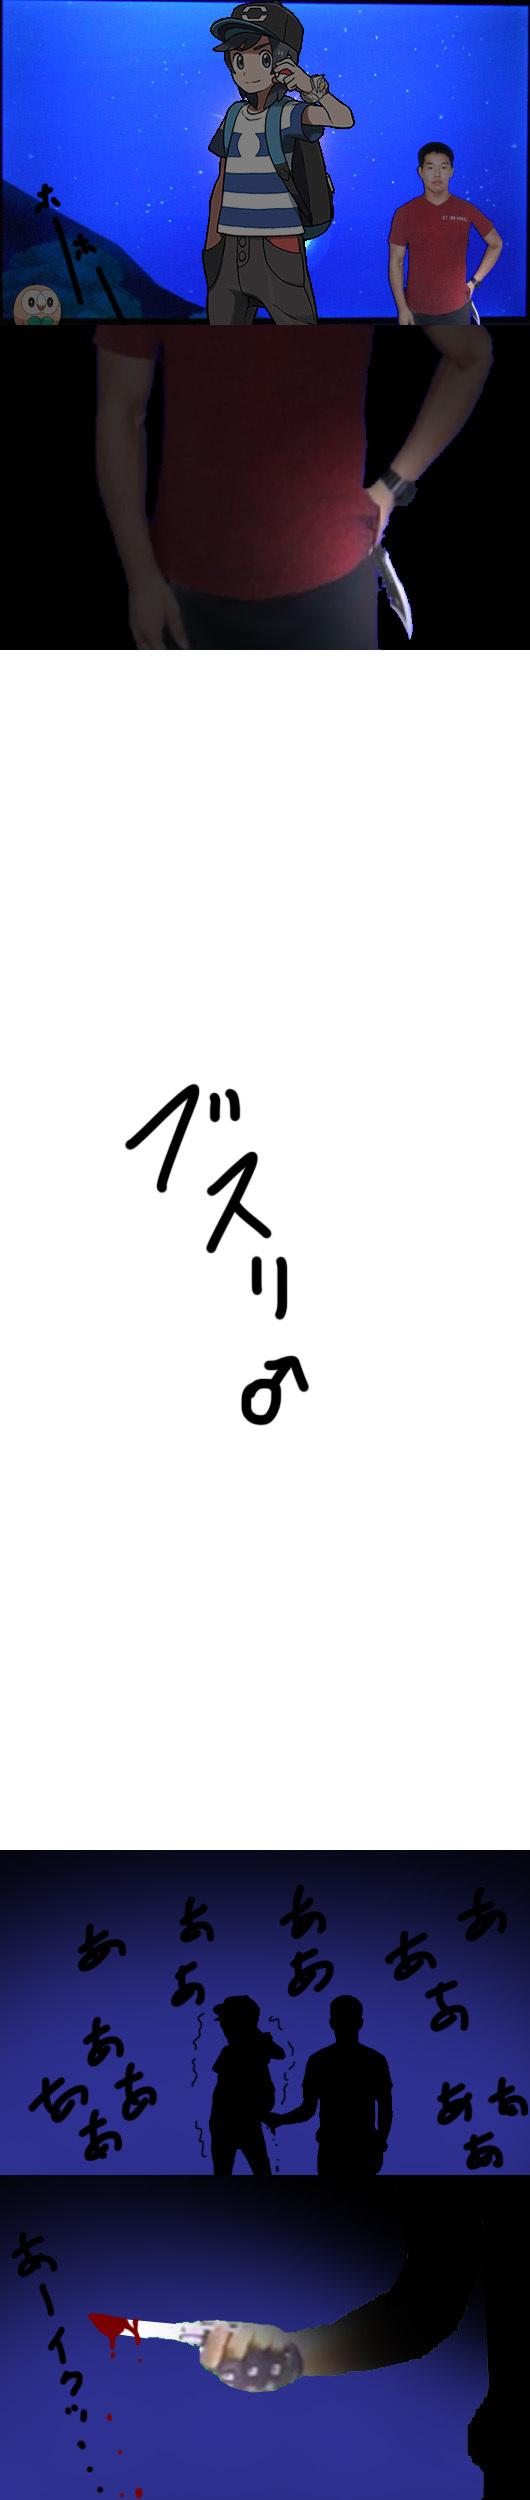 pkmnM13-36.jpg